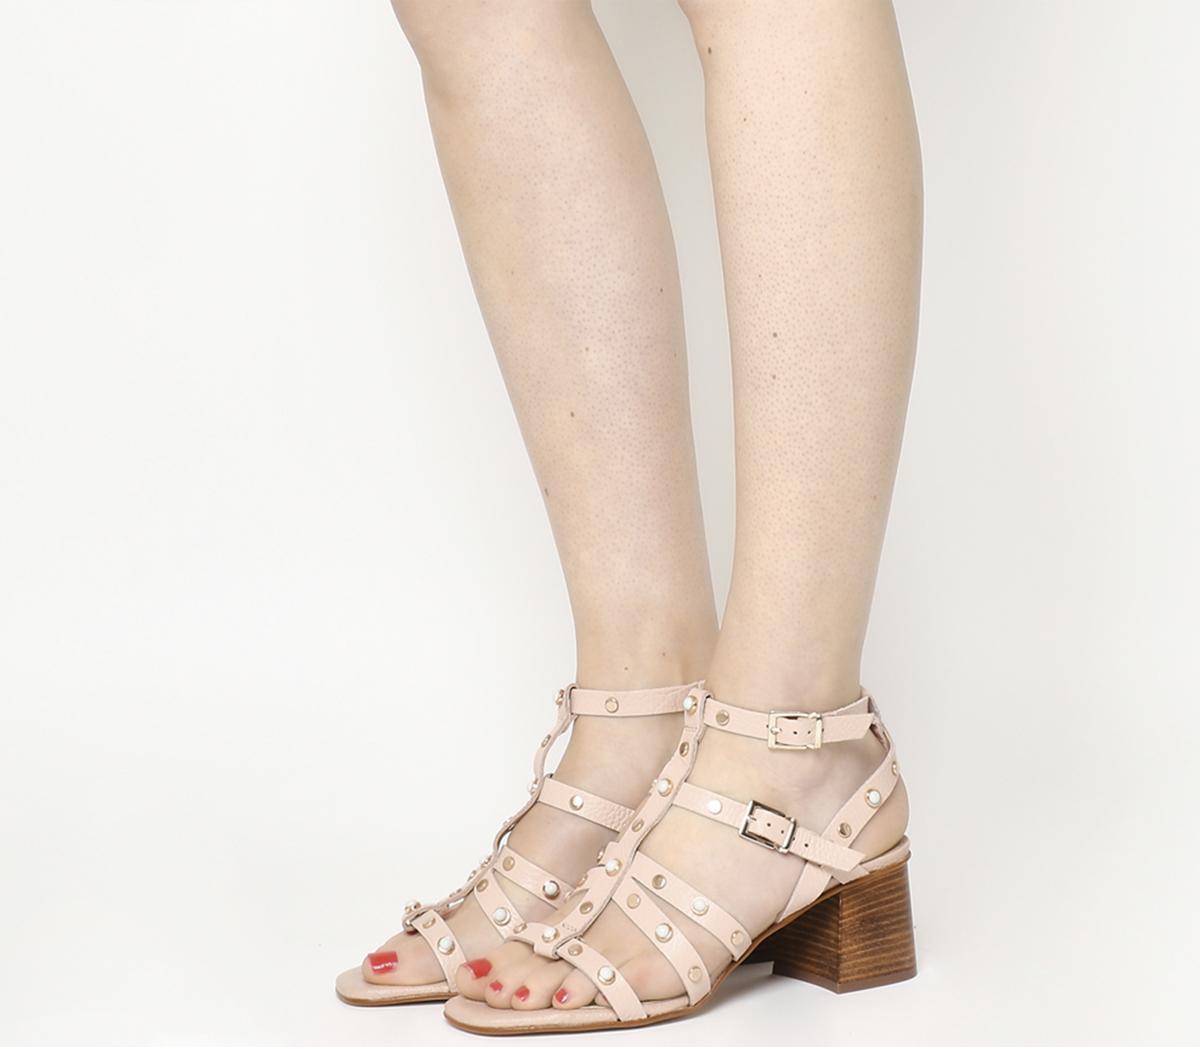 Margate Strappy Block Heels